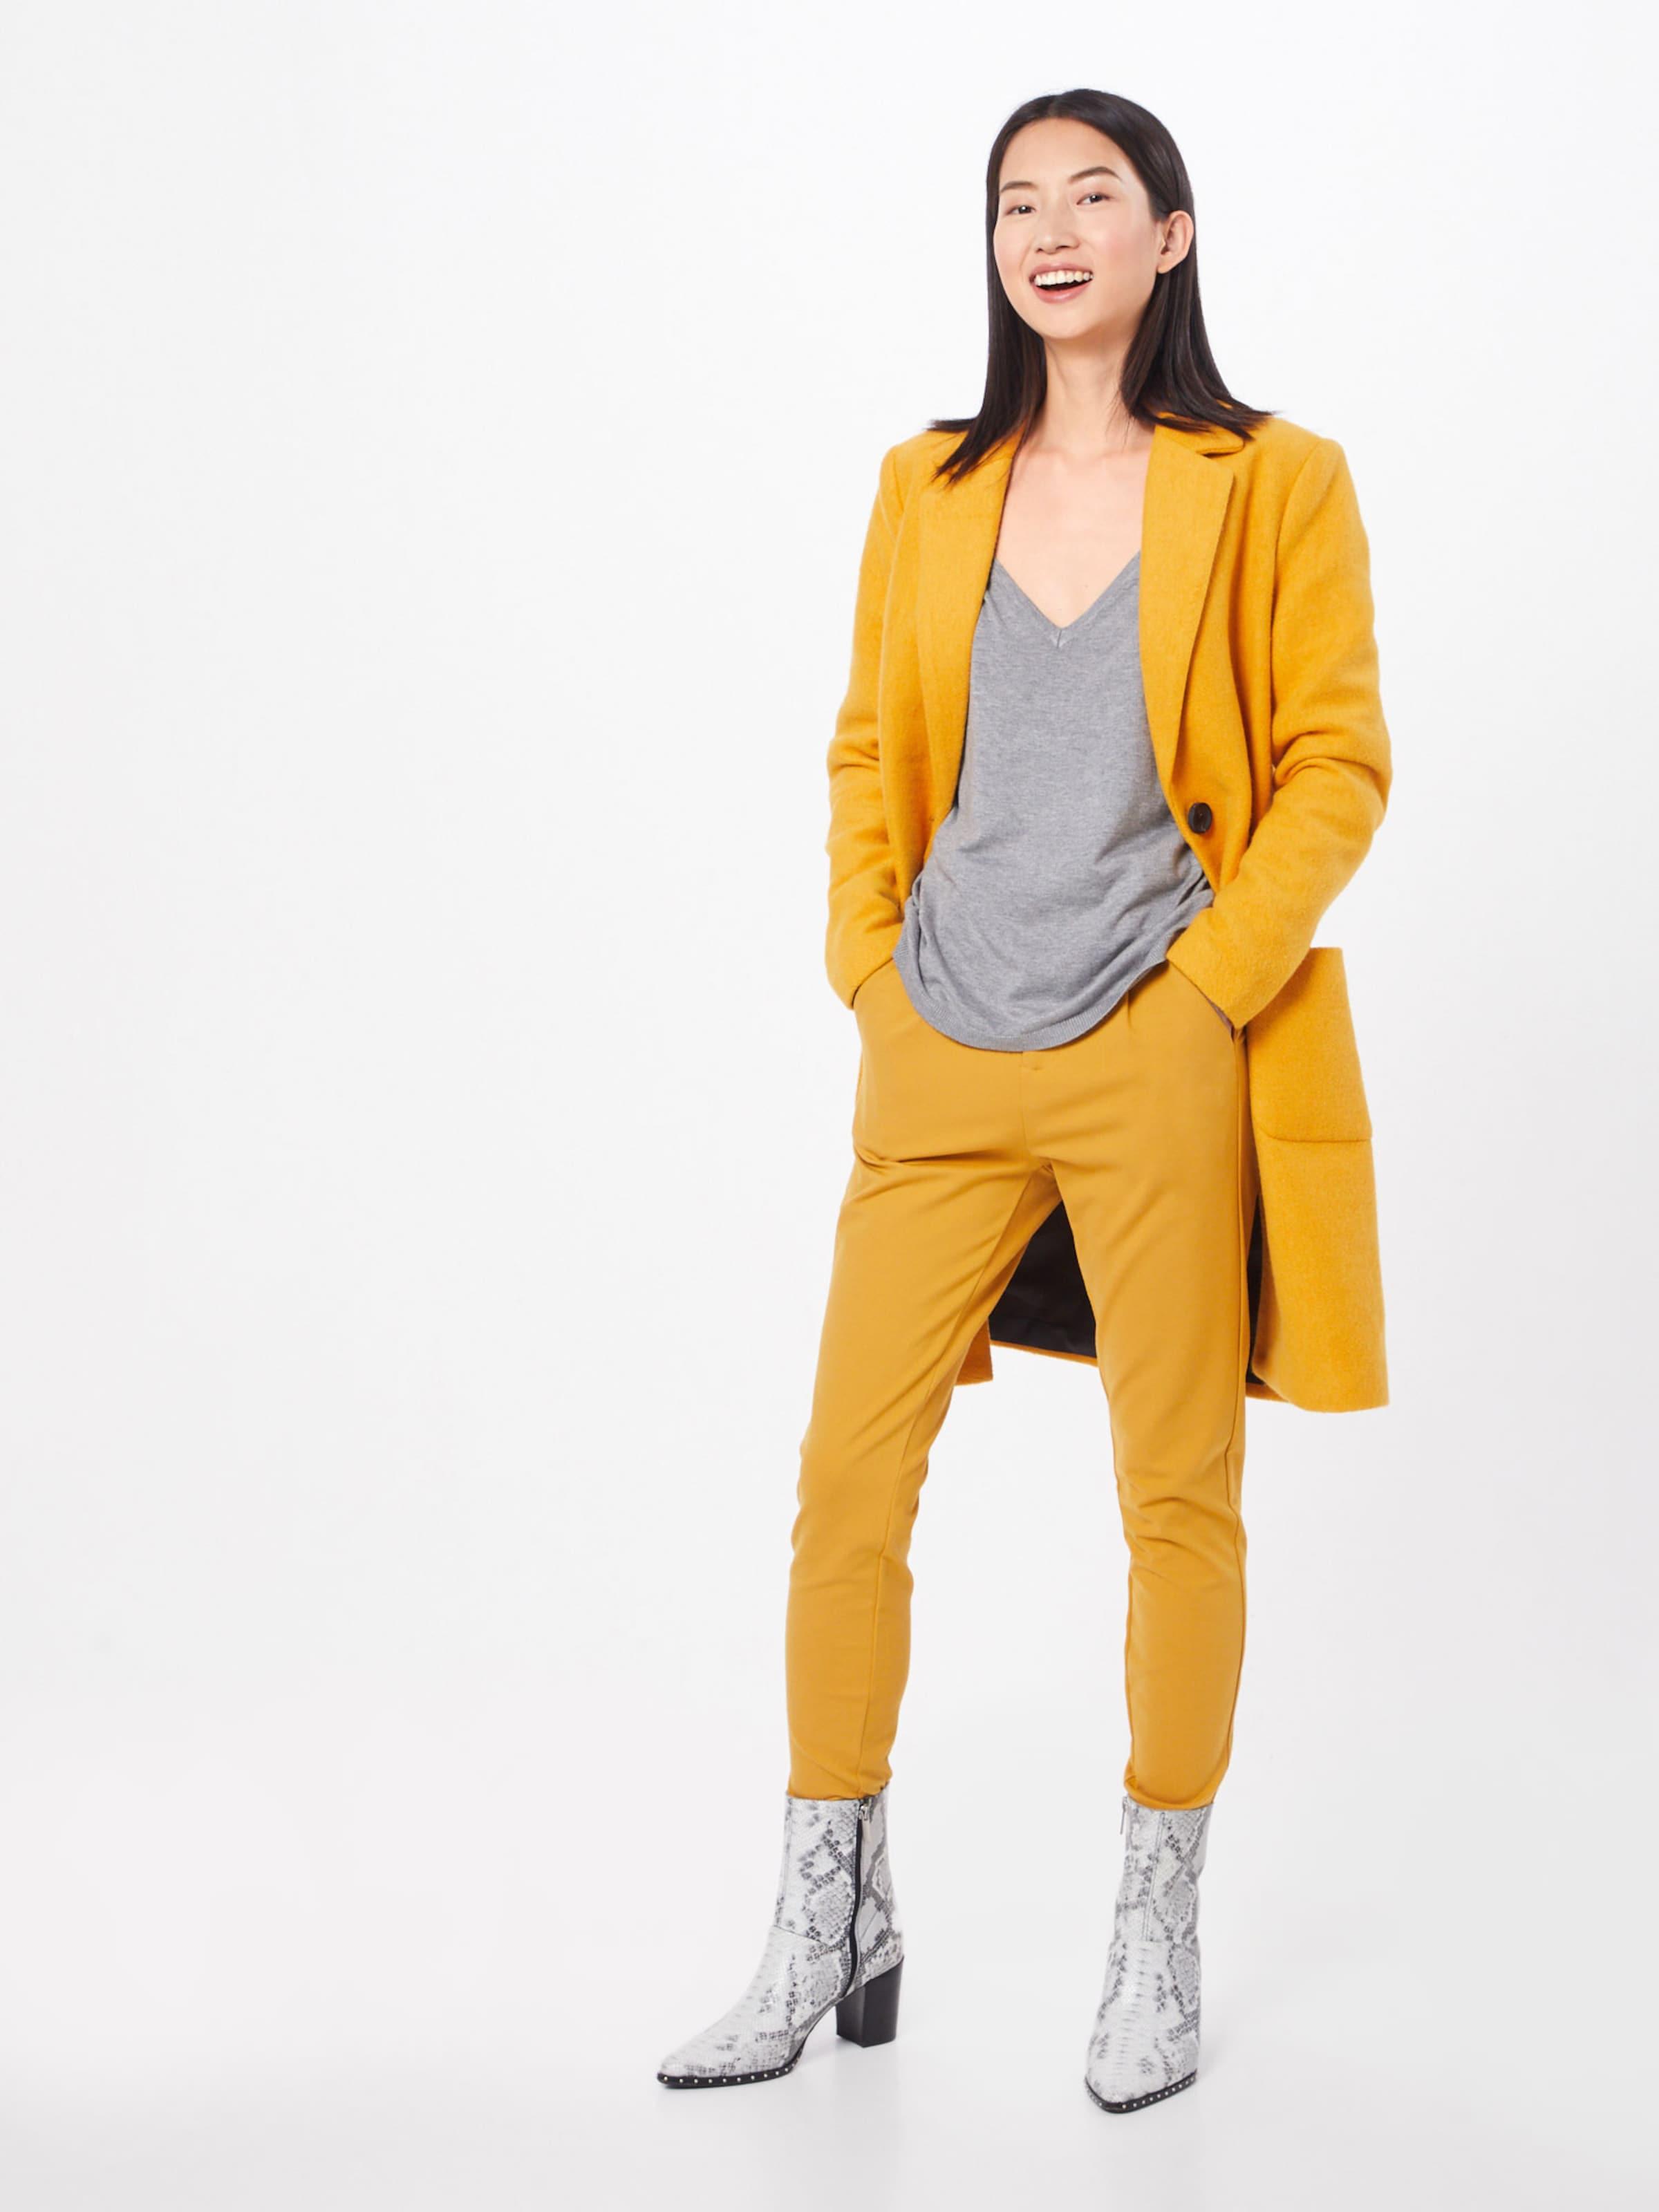 Pullover In Grau V Ichi 'mafa Ls2' 7yvYgbf6